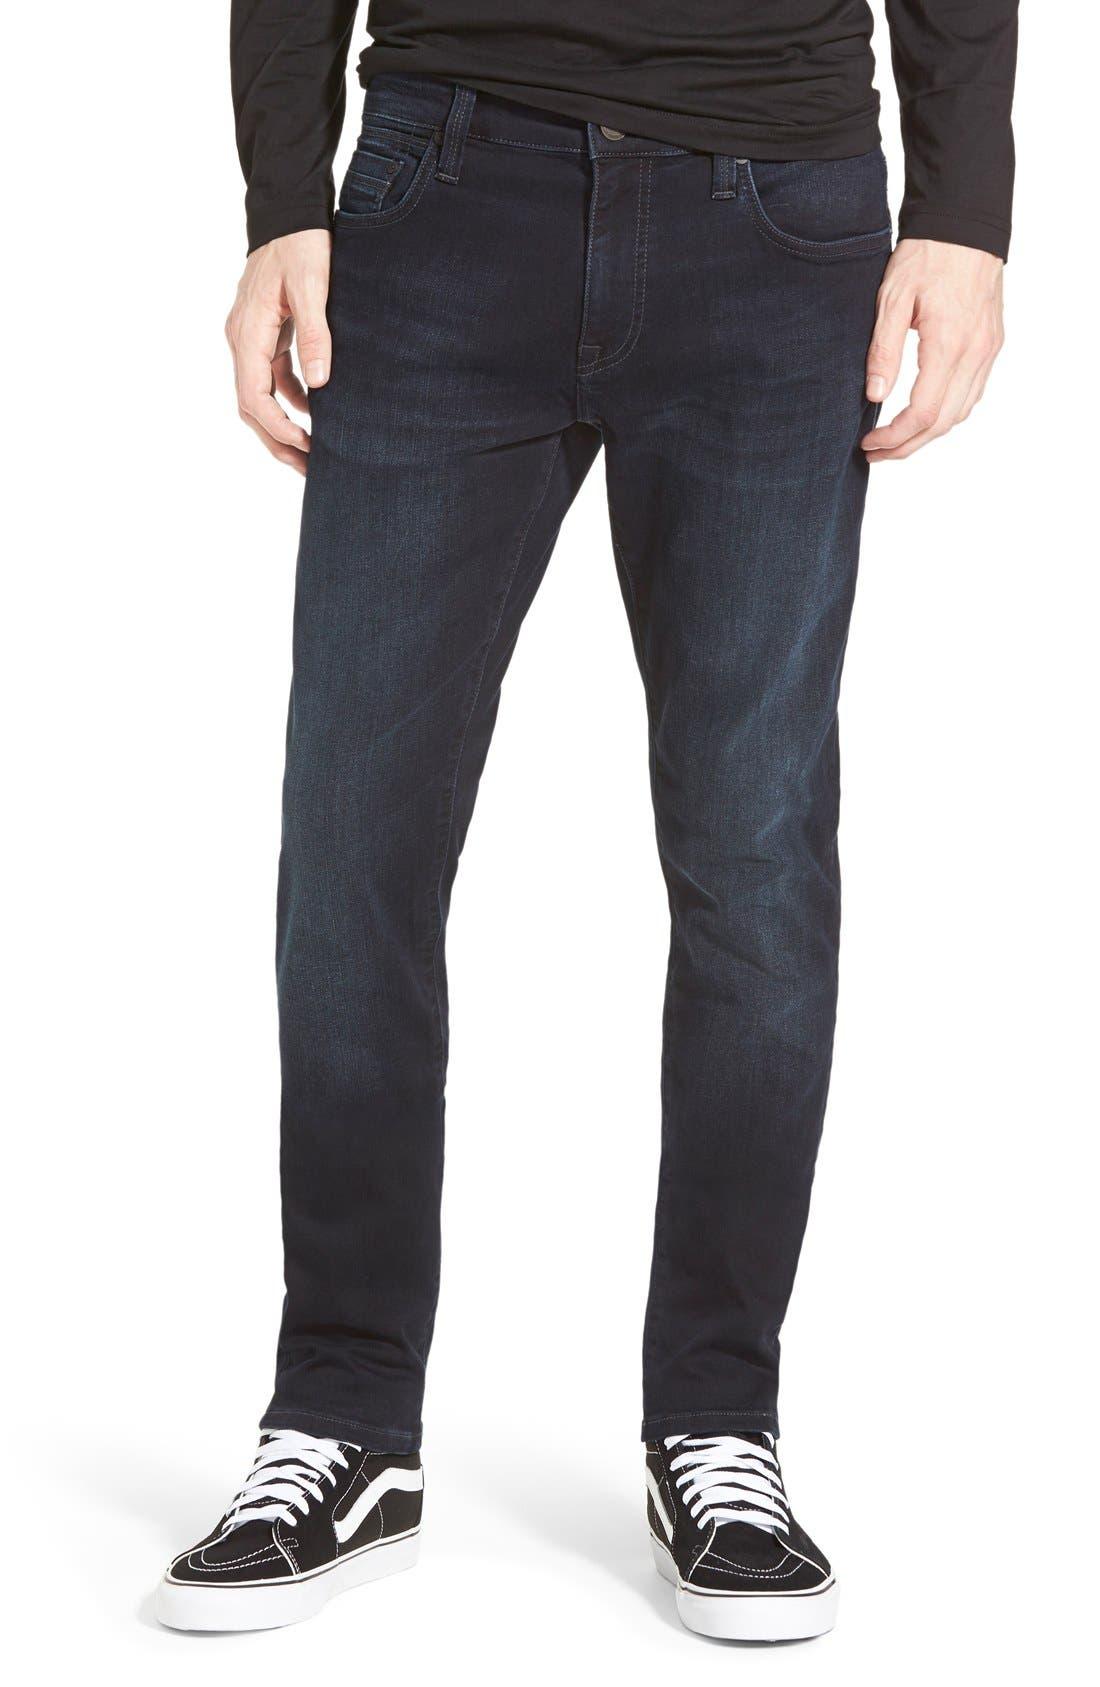 'James' Skinny Fit Jeans